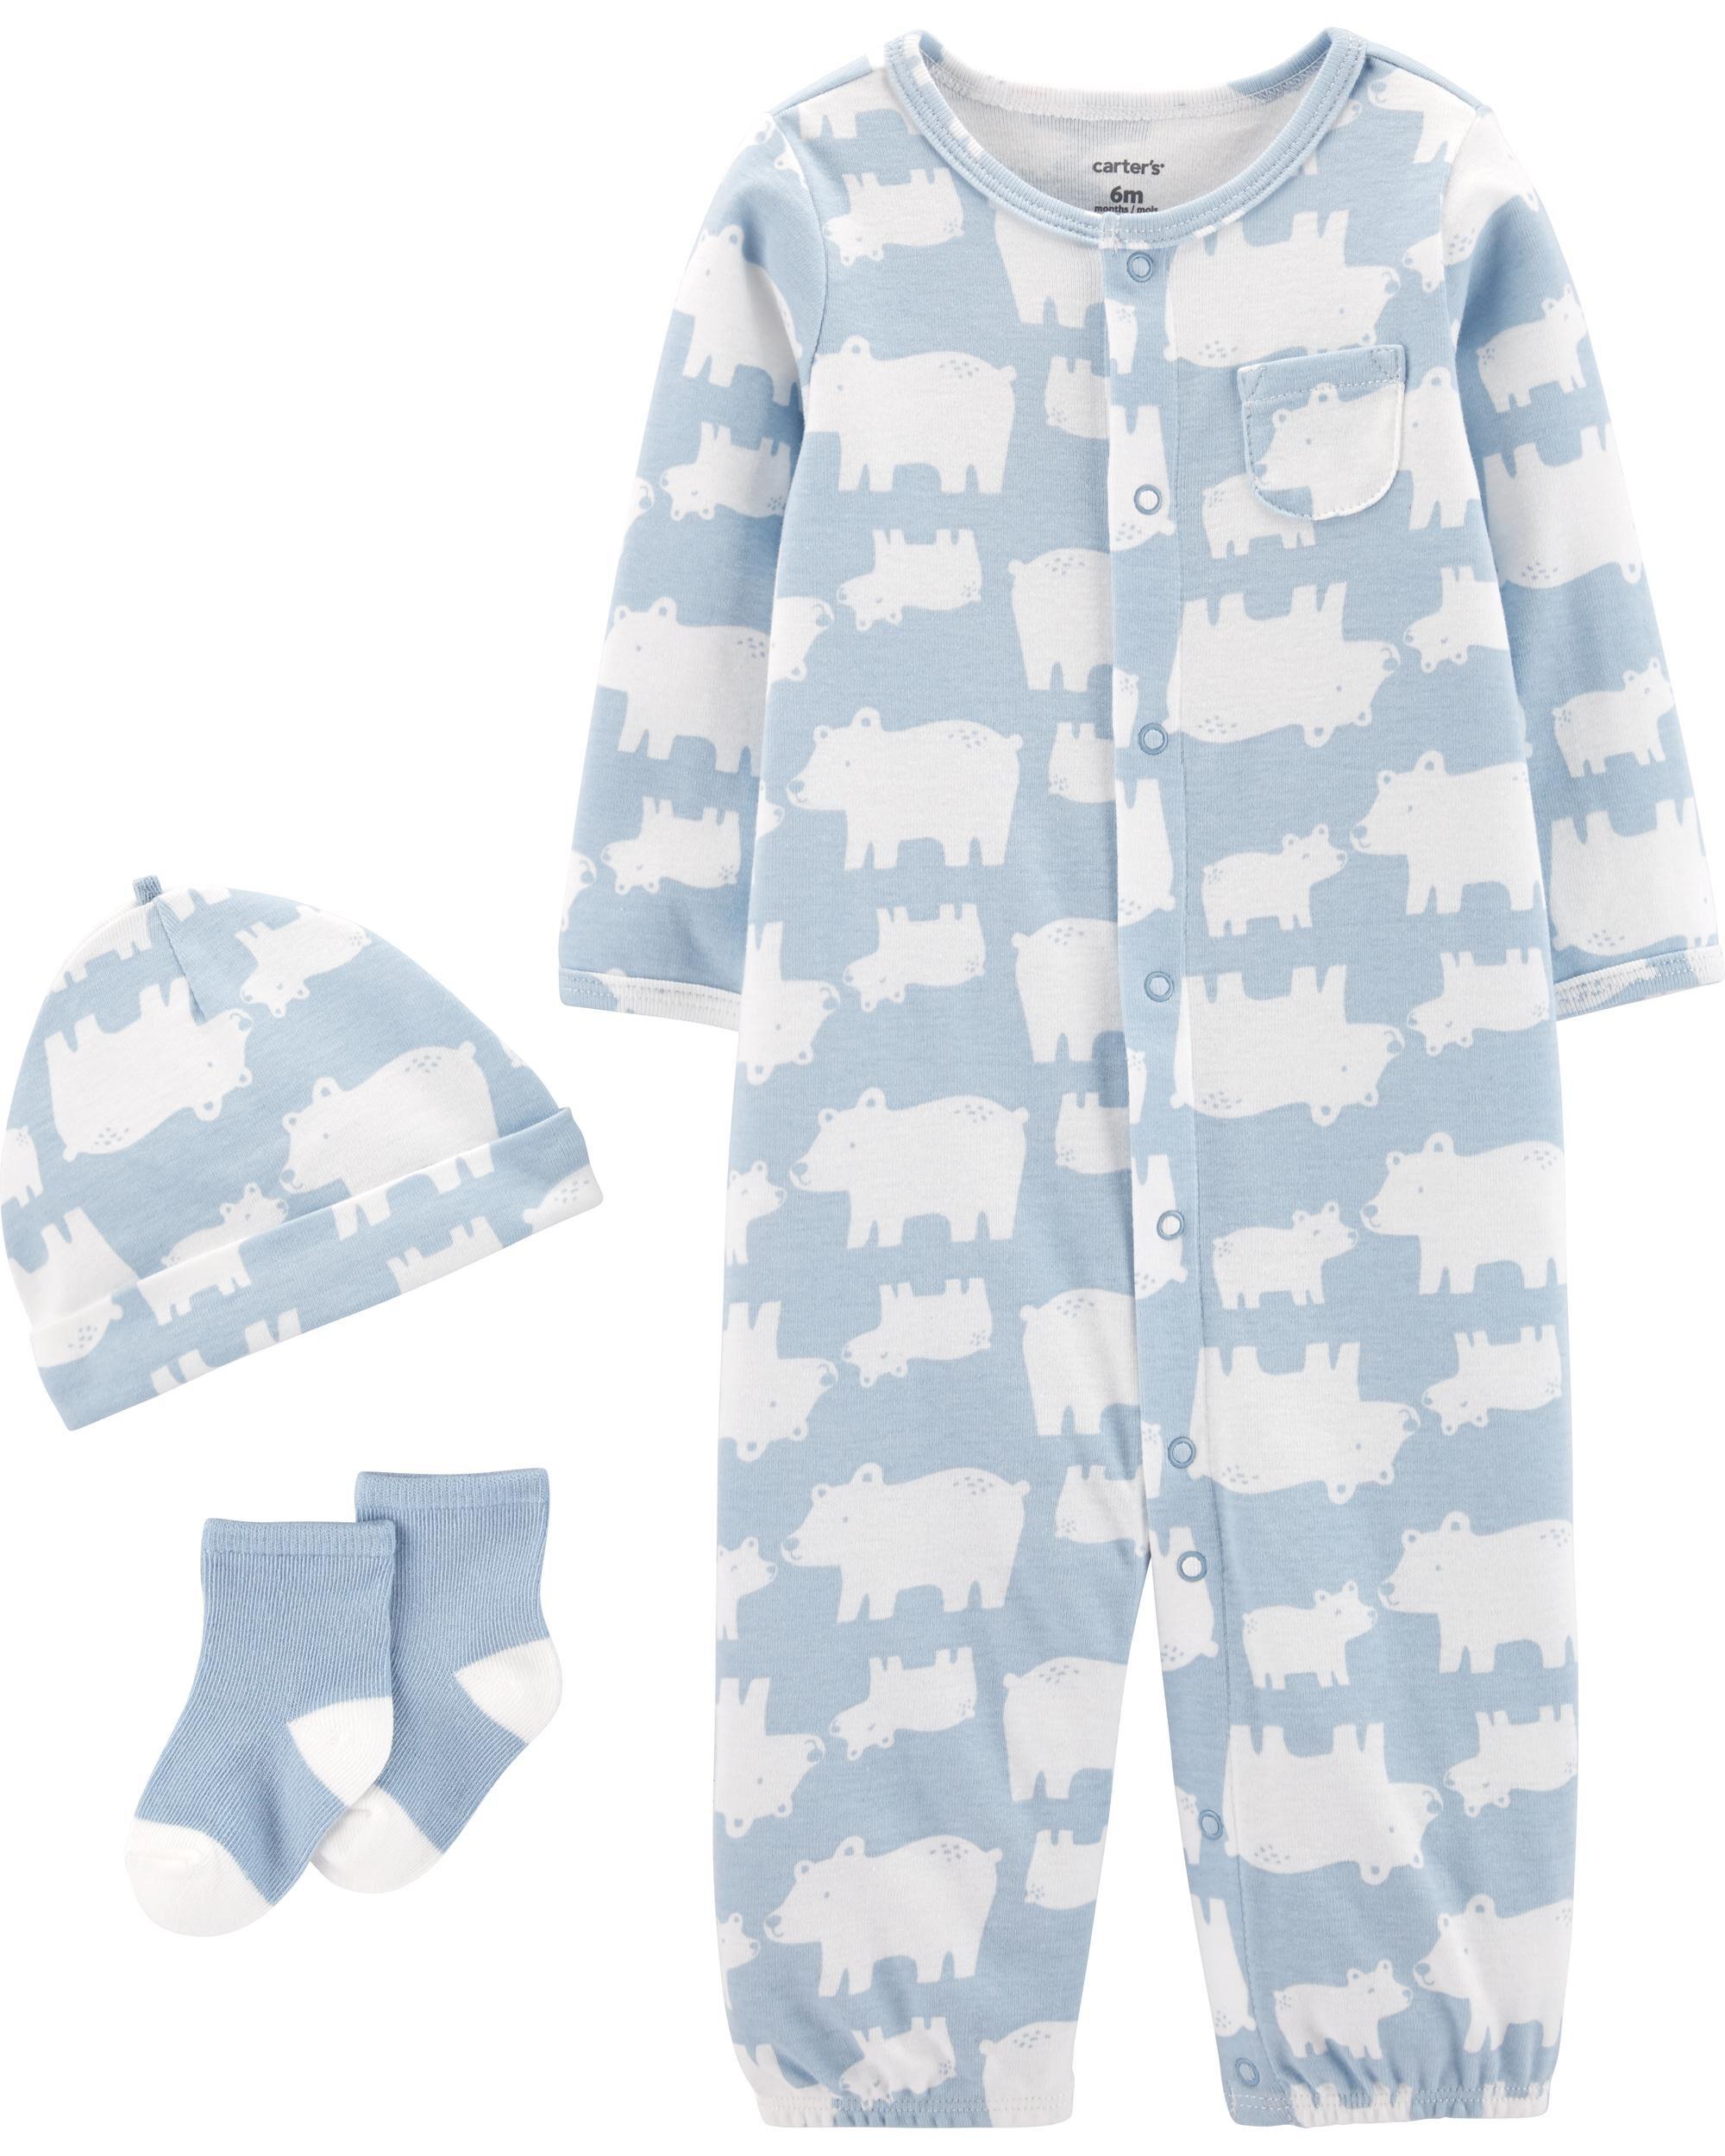 CARTER/'S 3 PIECE BABY BOYS CONVERTER GOWN  OUTFIT WHITE BLUE GIRAFFE